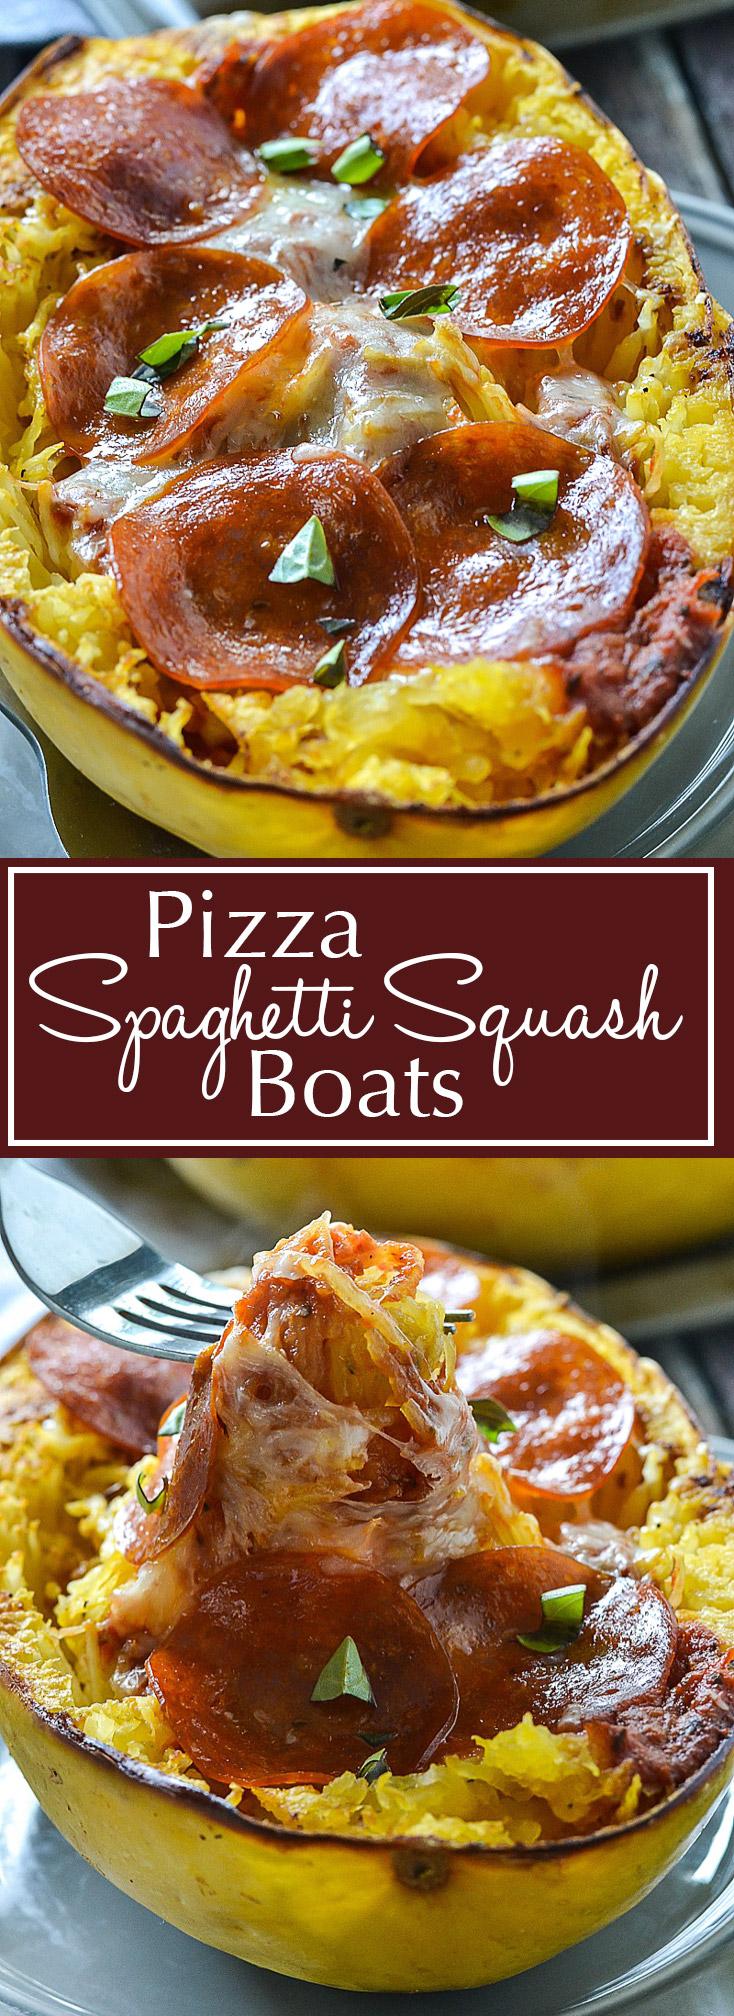 Pizza Spaghetti Squash Boats   www.motherthyme.com